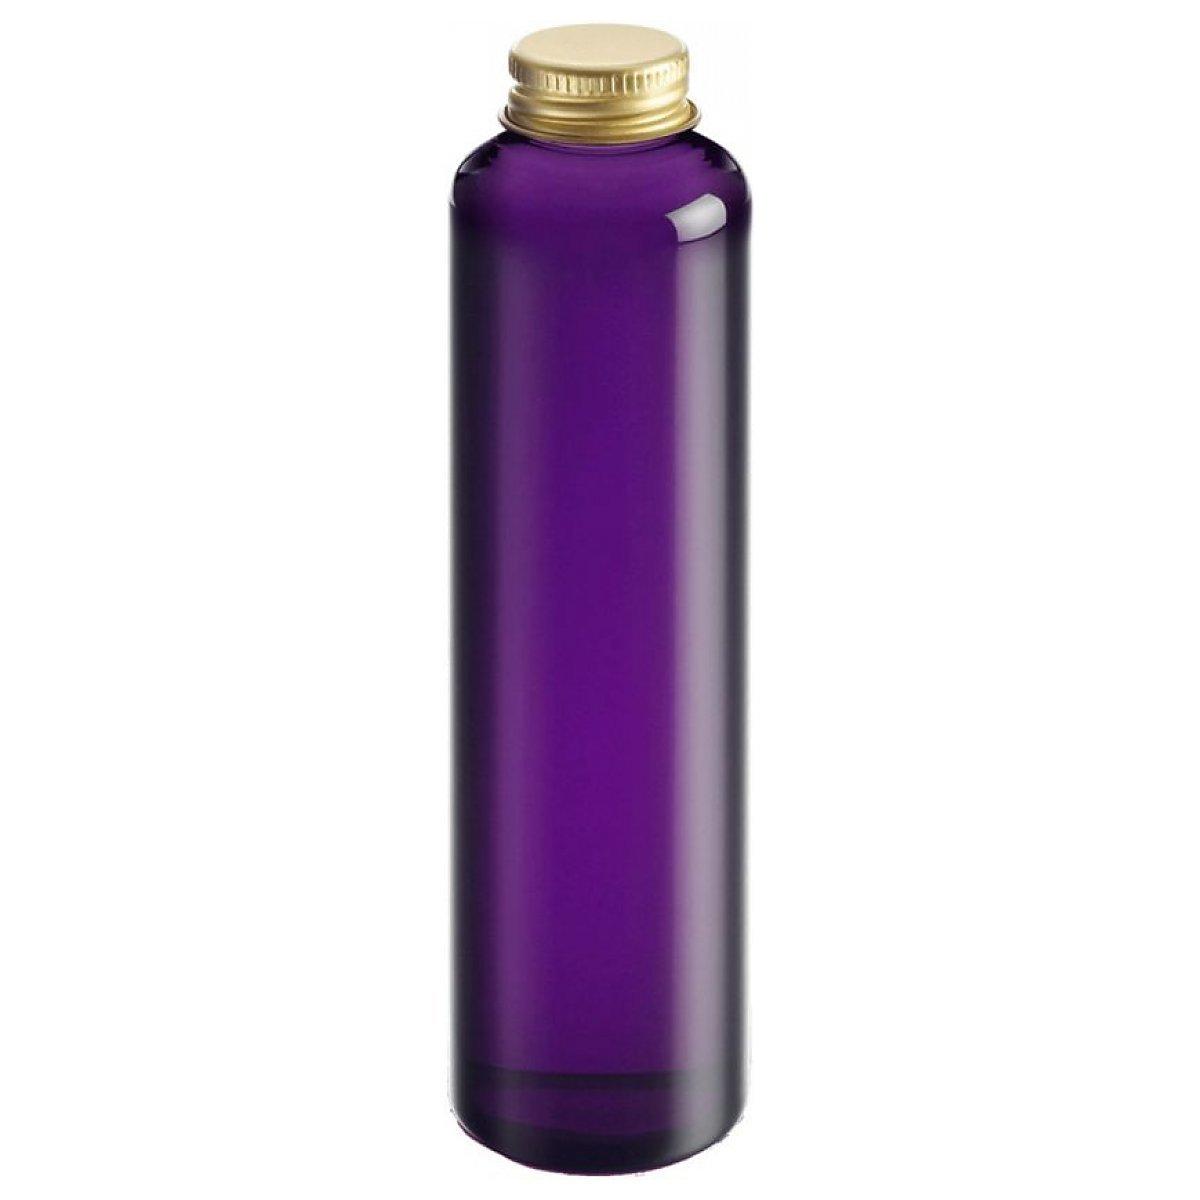 Alien Perfume Refill Sephora: Thierry Mugler Alien Woda Perfumowana Zapas 60ml